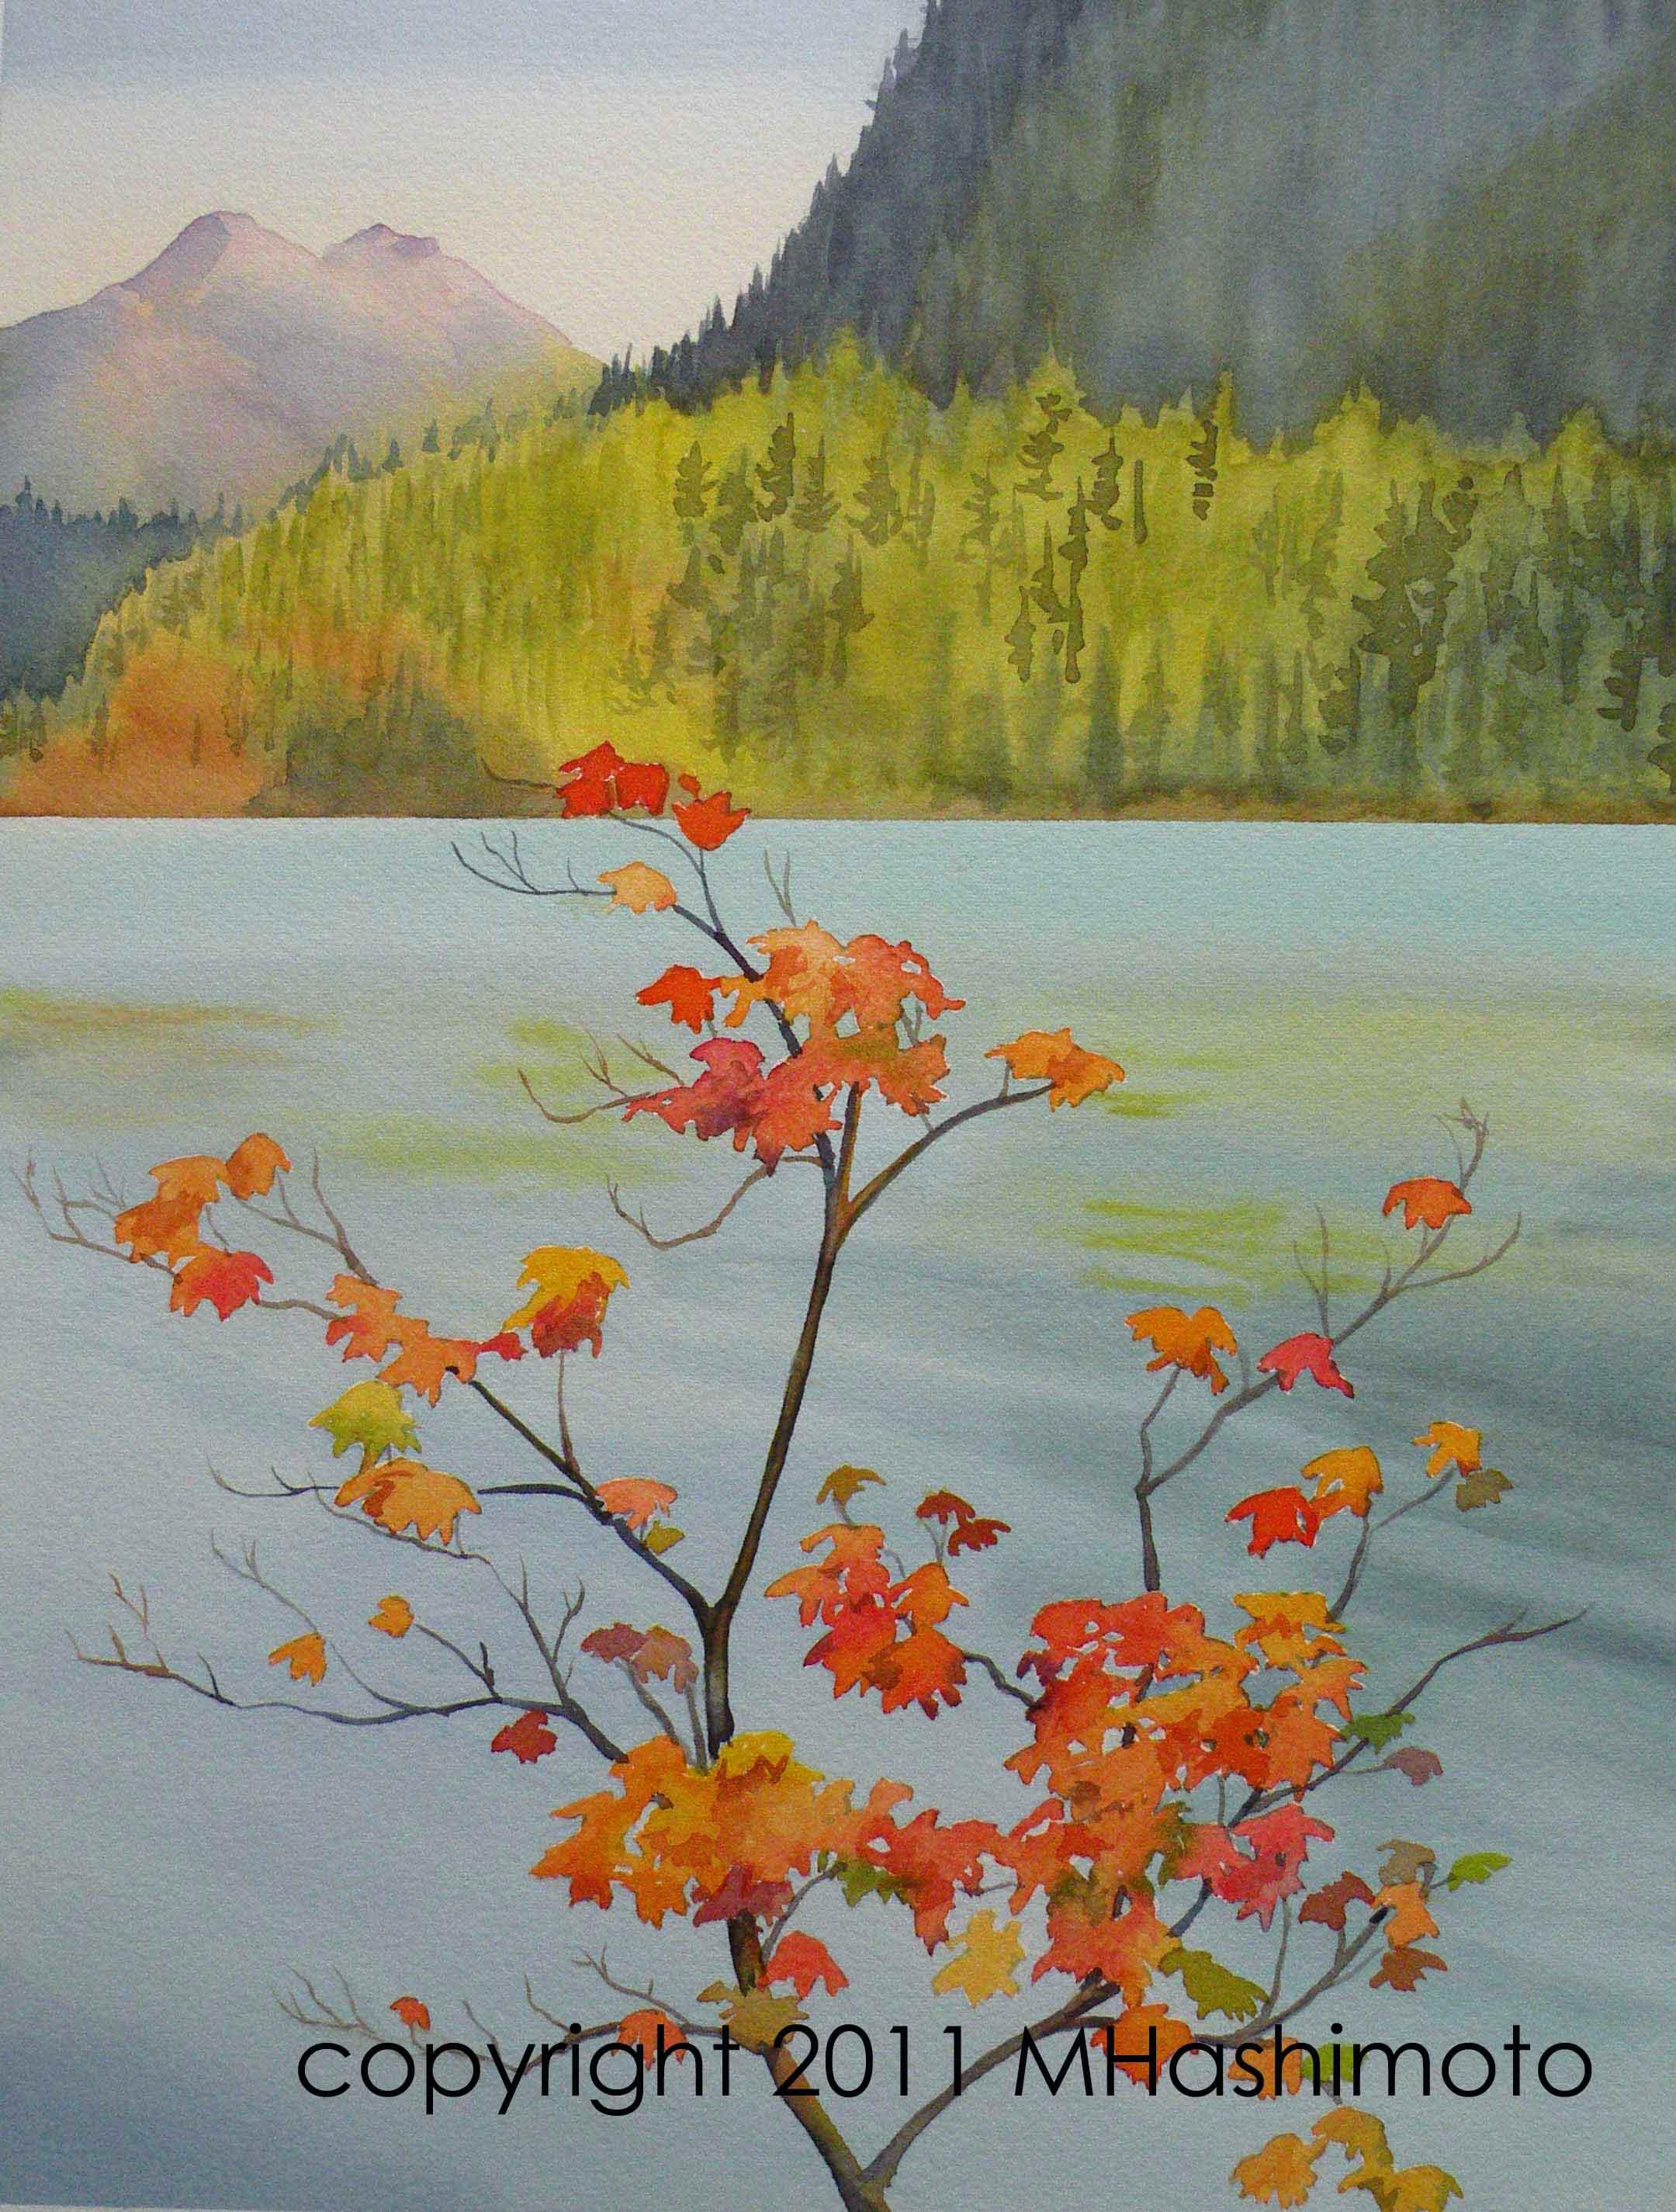 Vine Maple, Diablo Lake - Giclee Print $75